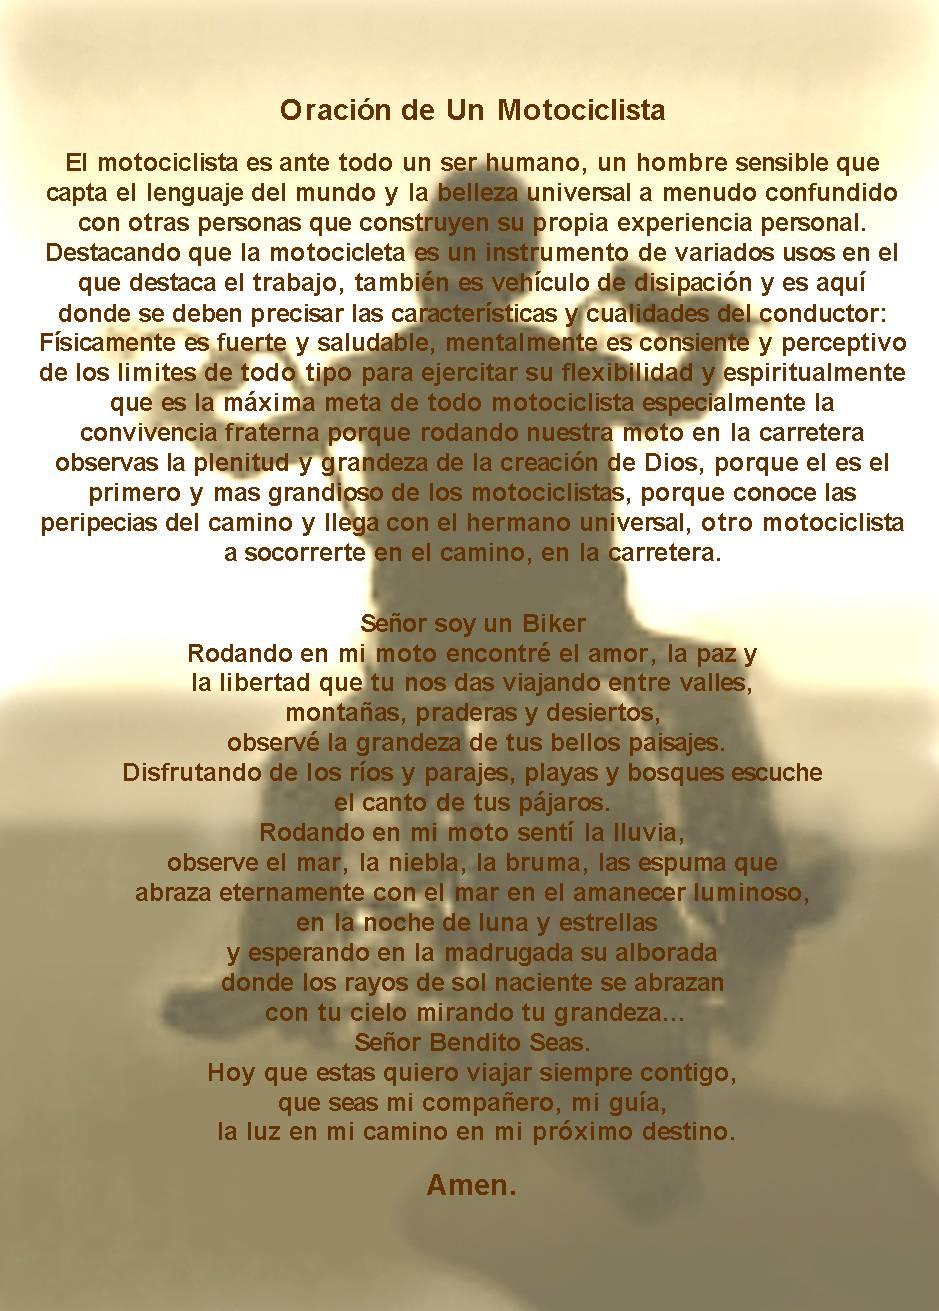 MOTOS PARA EL RECUERDO DE LOS ESPAÑOLES-http://4.bp.blogspot.com/_XIjV7yFBPg8/TI5E0Fjj7dI/AAAAAAAACfg/hcBgHo1wPwk/s1600/oracion.jpg